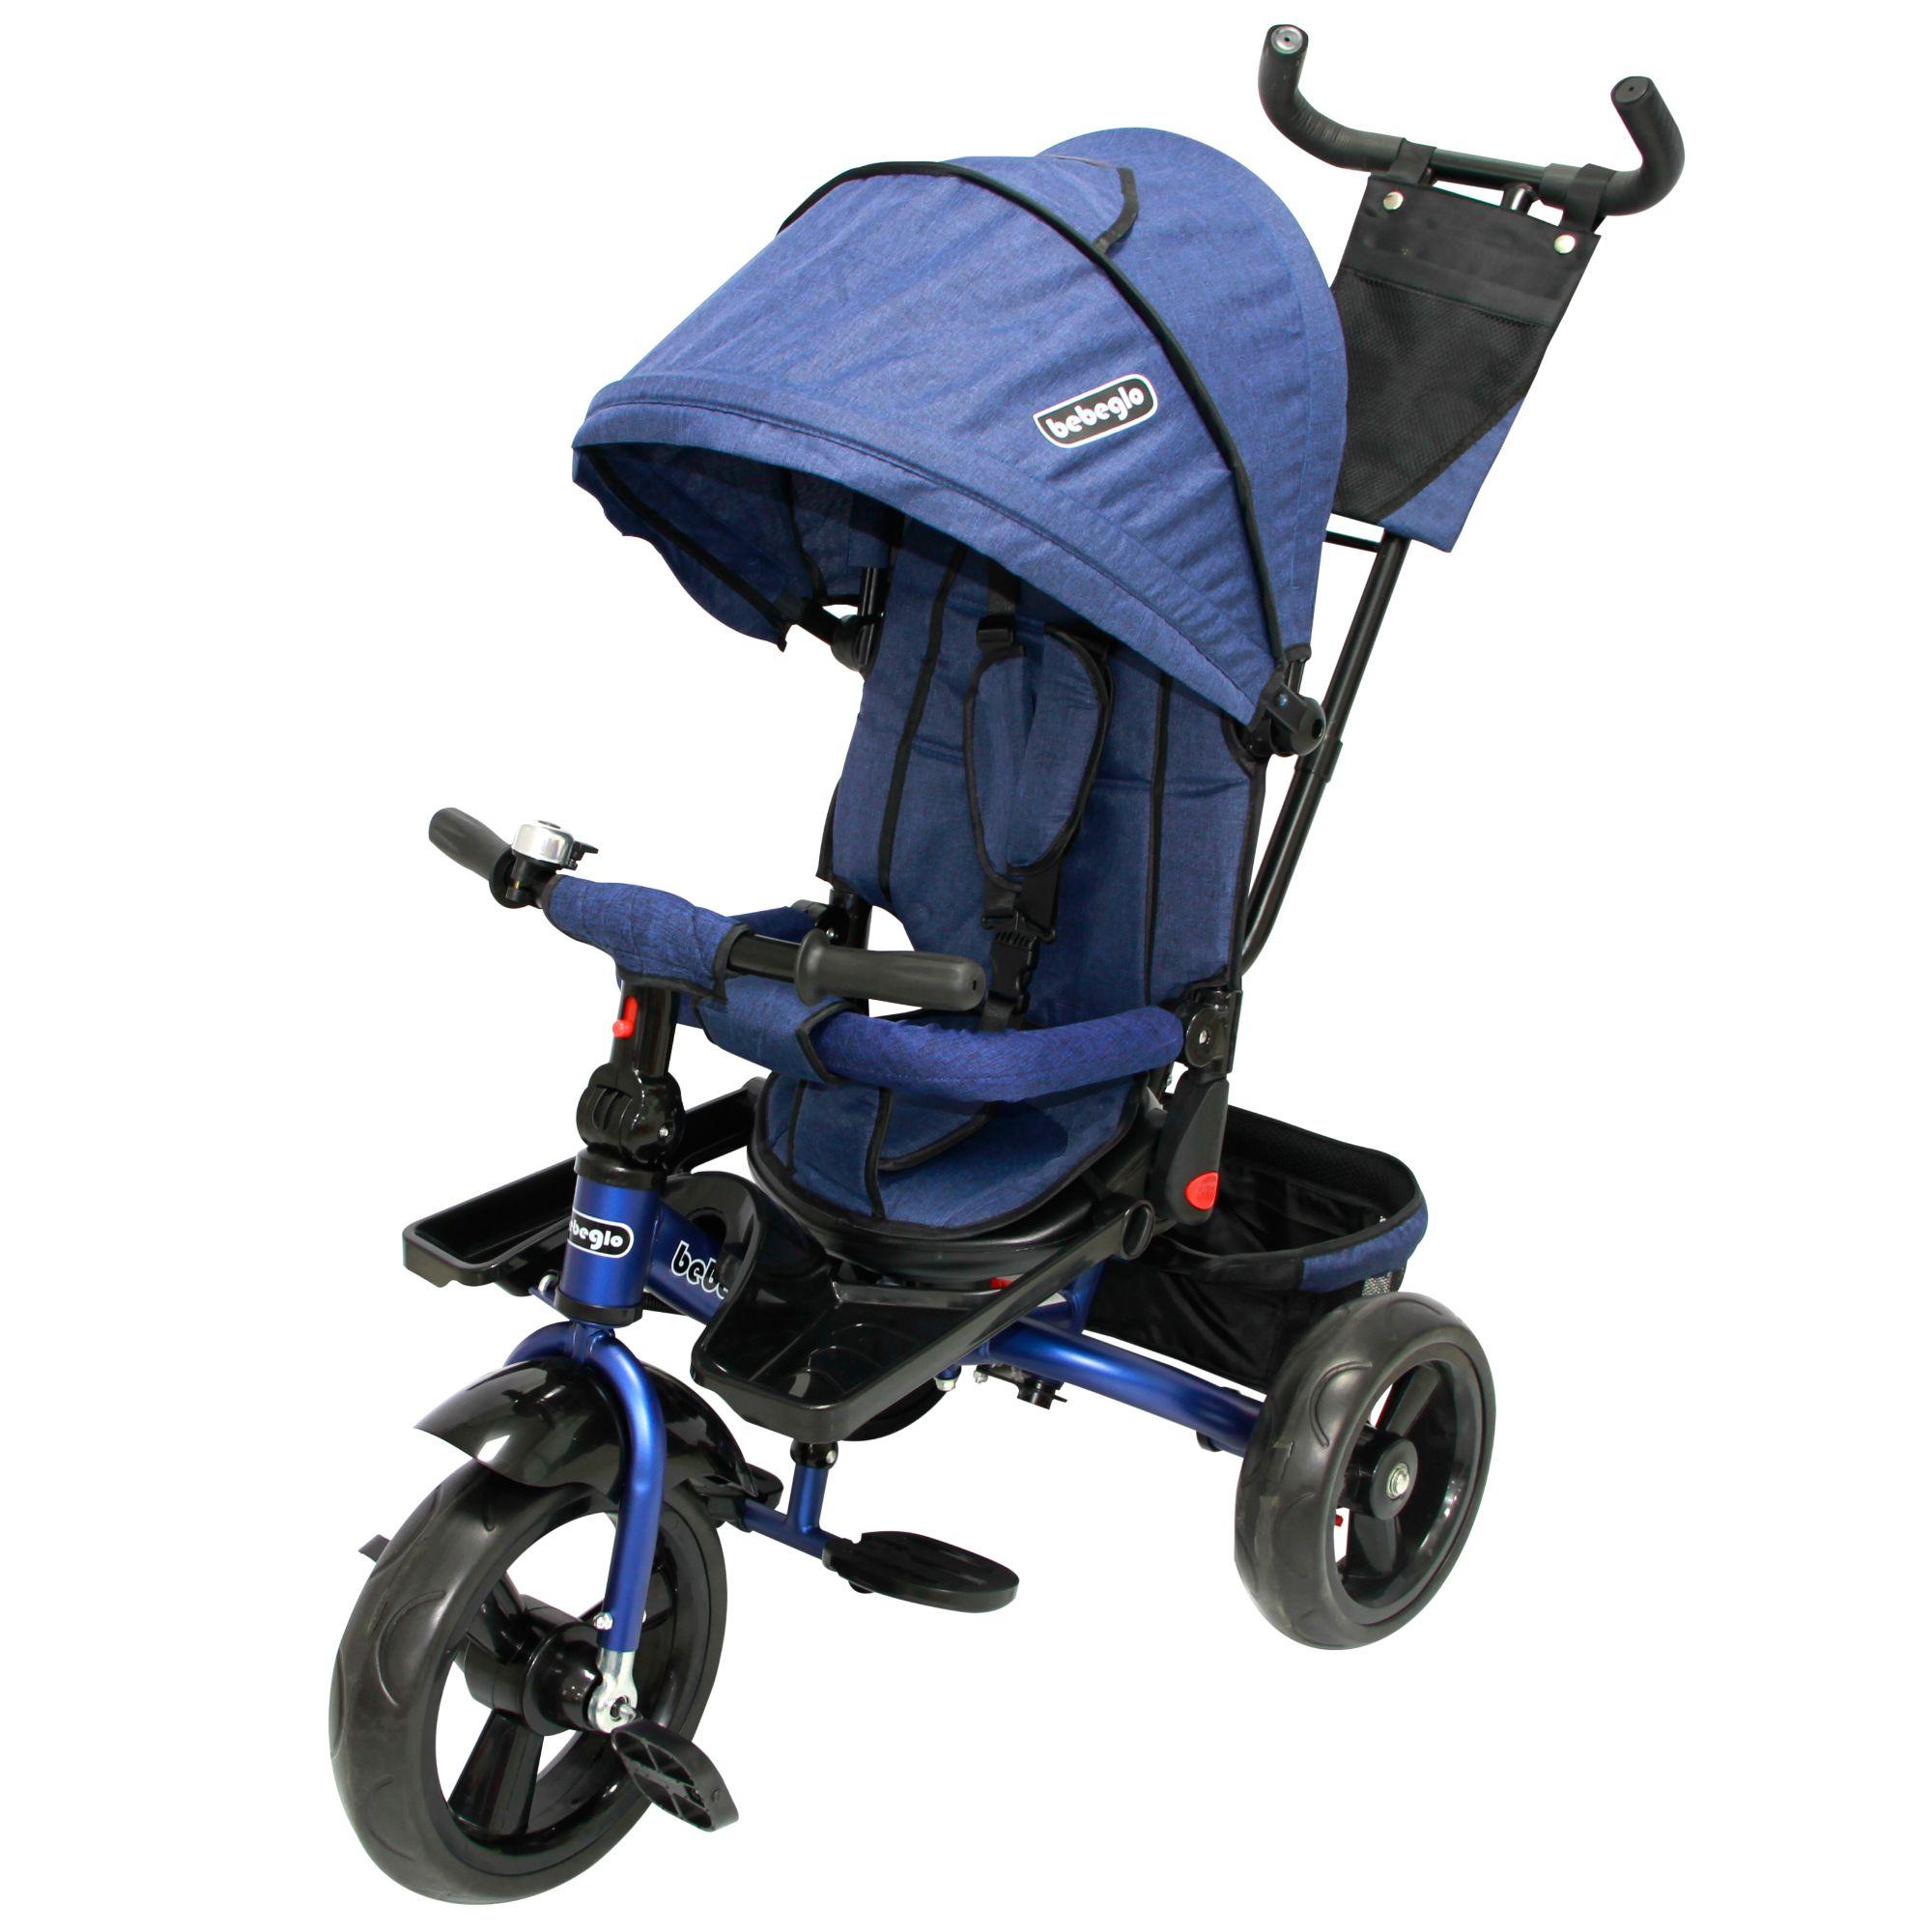 Triciclo Bebeglo Reversible One Click - Azul